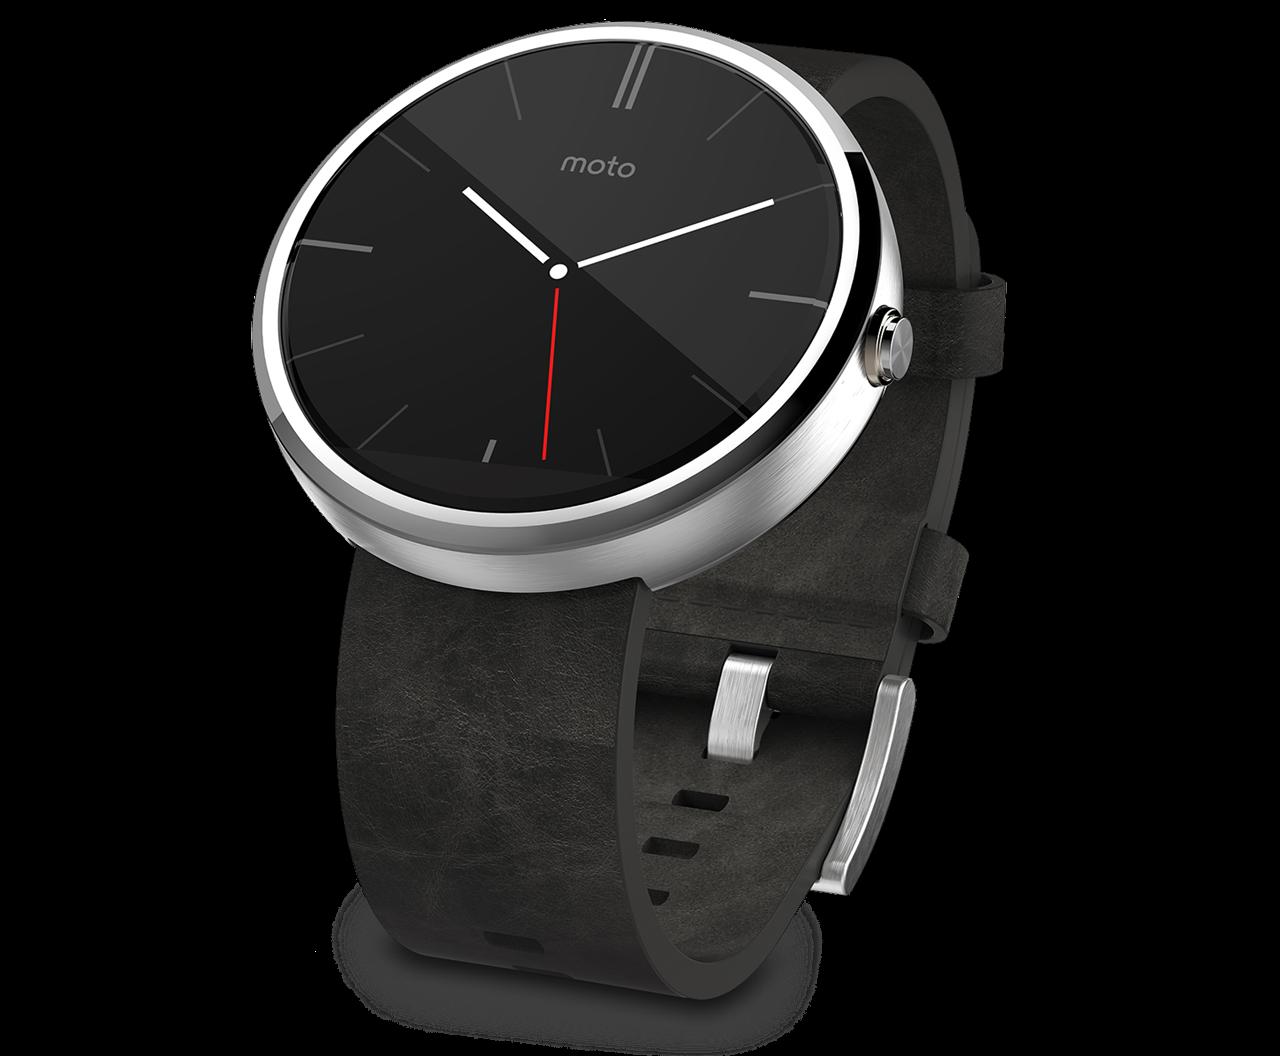 Motorola Moto 360 smartwatch running on Android Wear ...